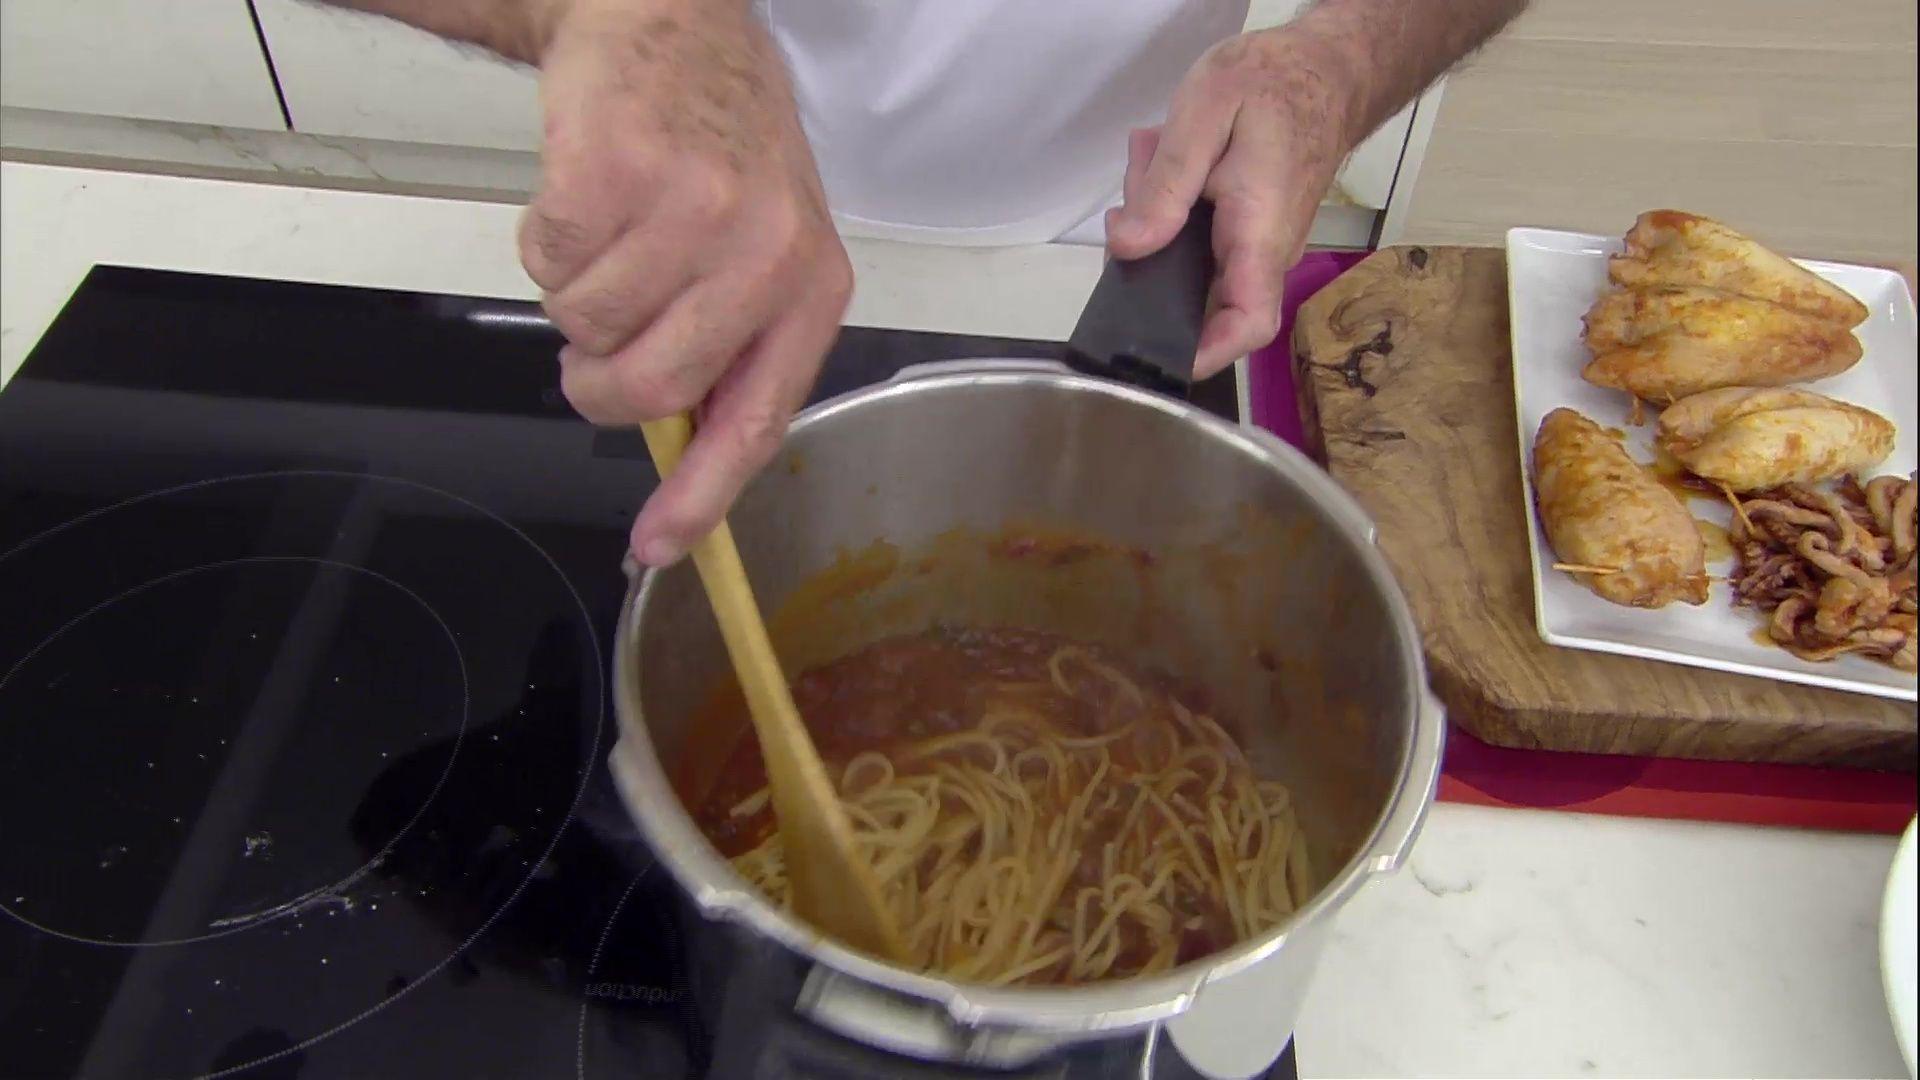 Calamares rellenos a la italiana